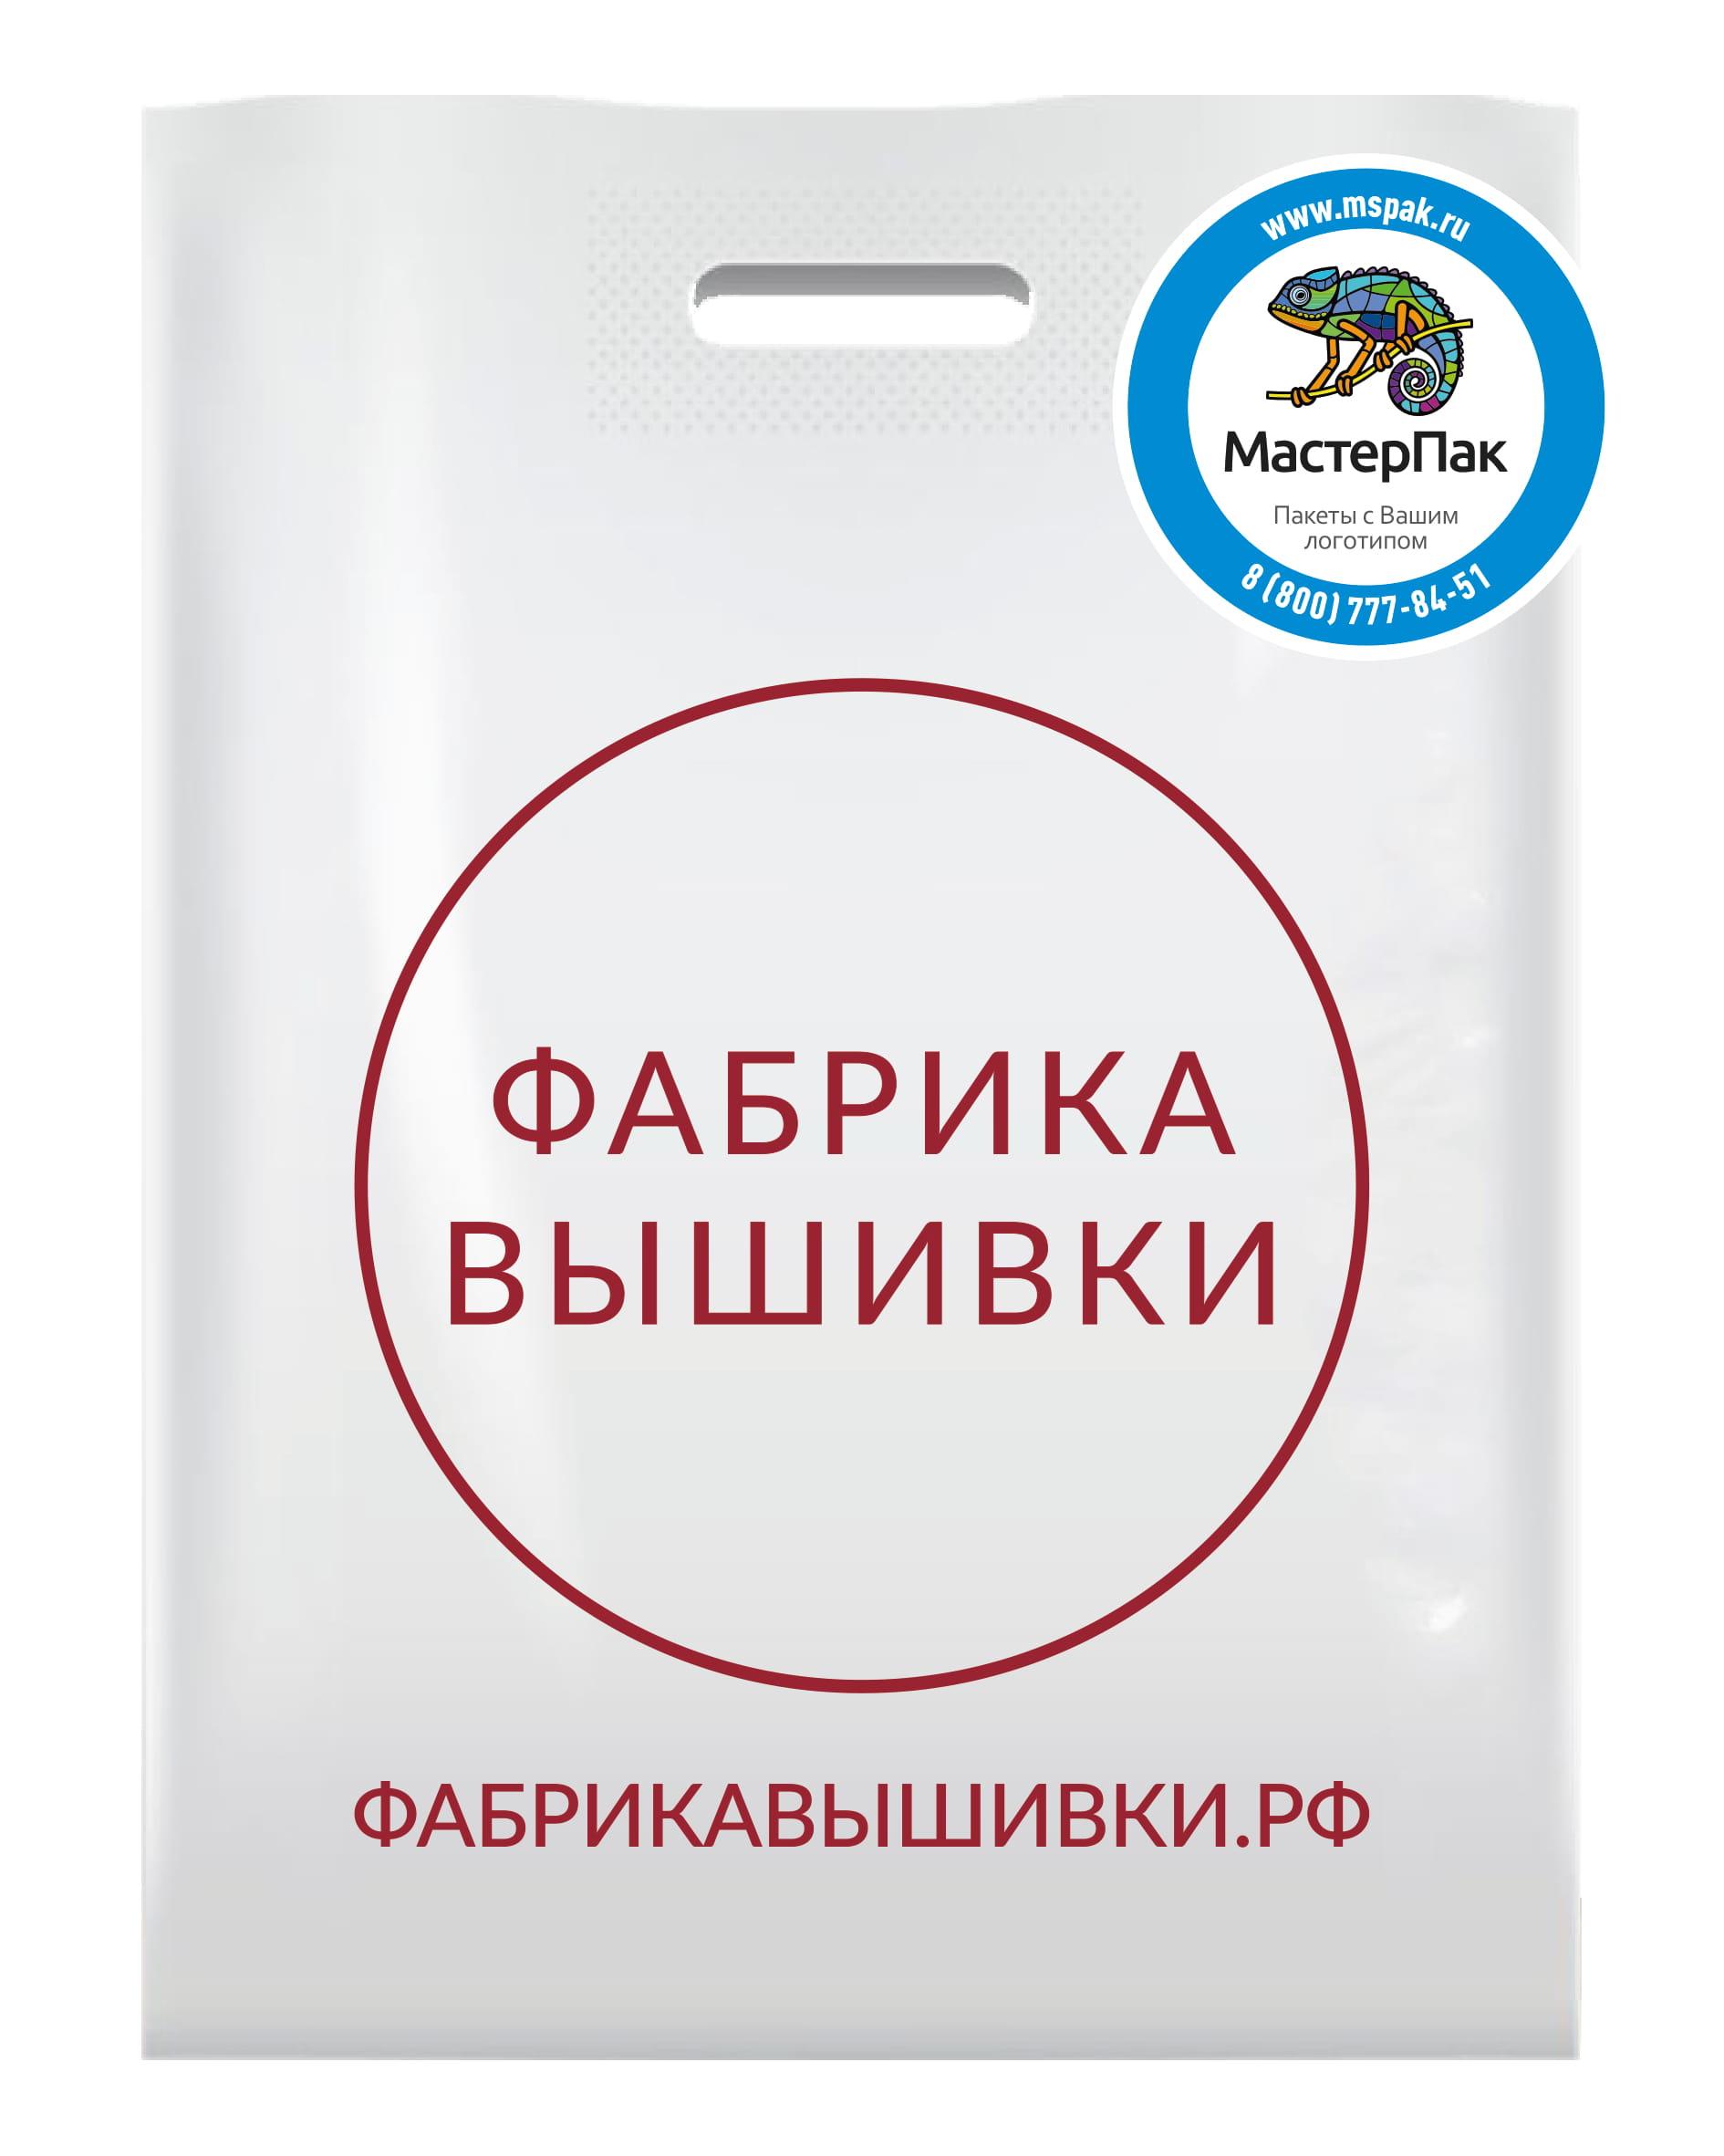 Пакет ПВД с логотипом «Фабрика вышивки», Томск, 30*40 см, 70 мкм